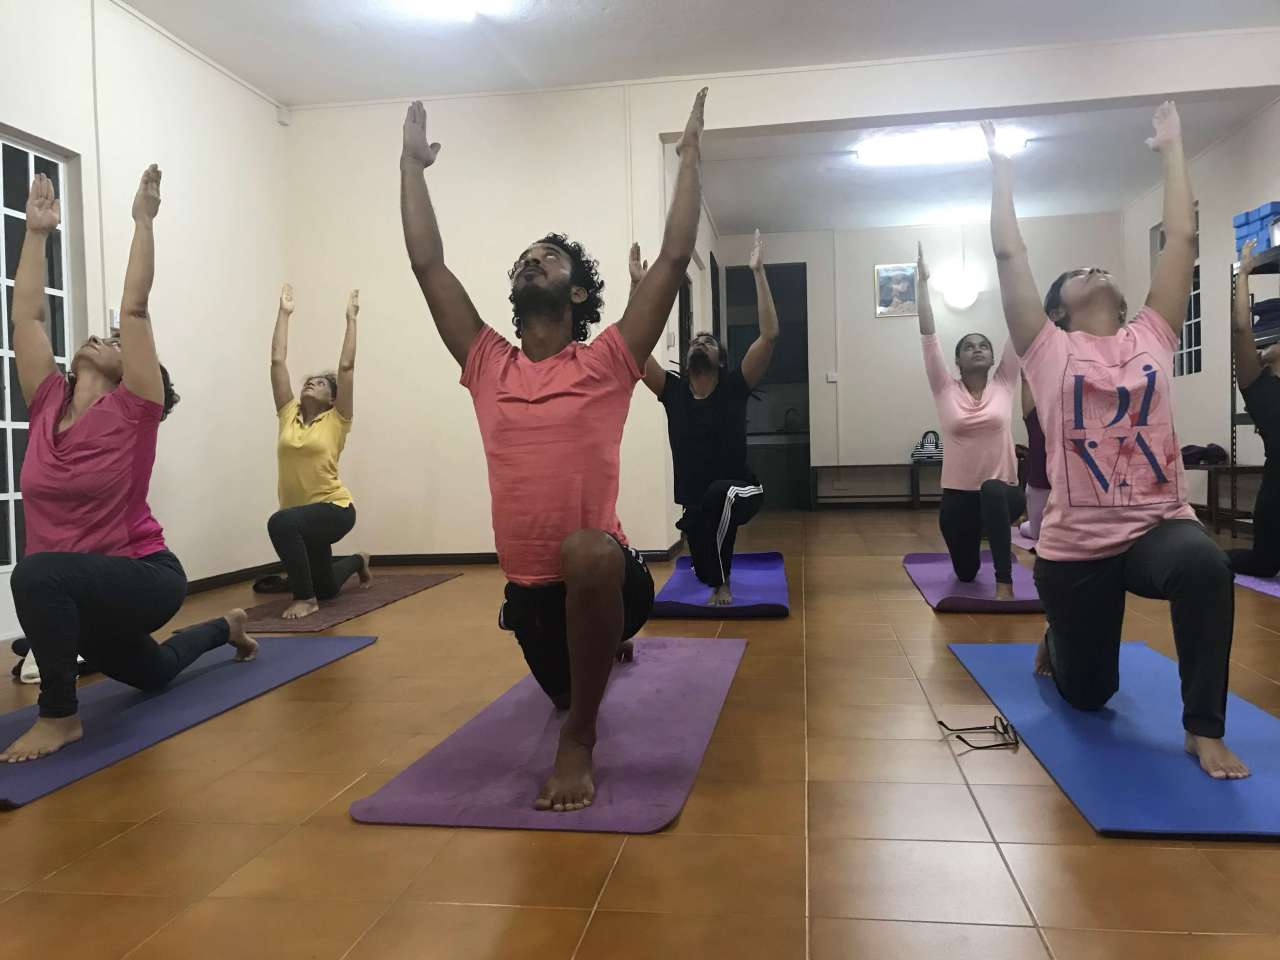 Tamarind Leaf Yoga Centre